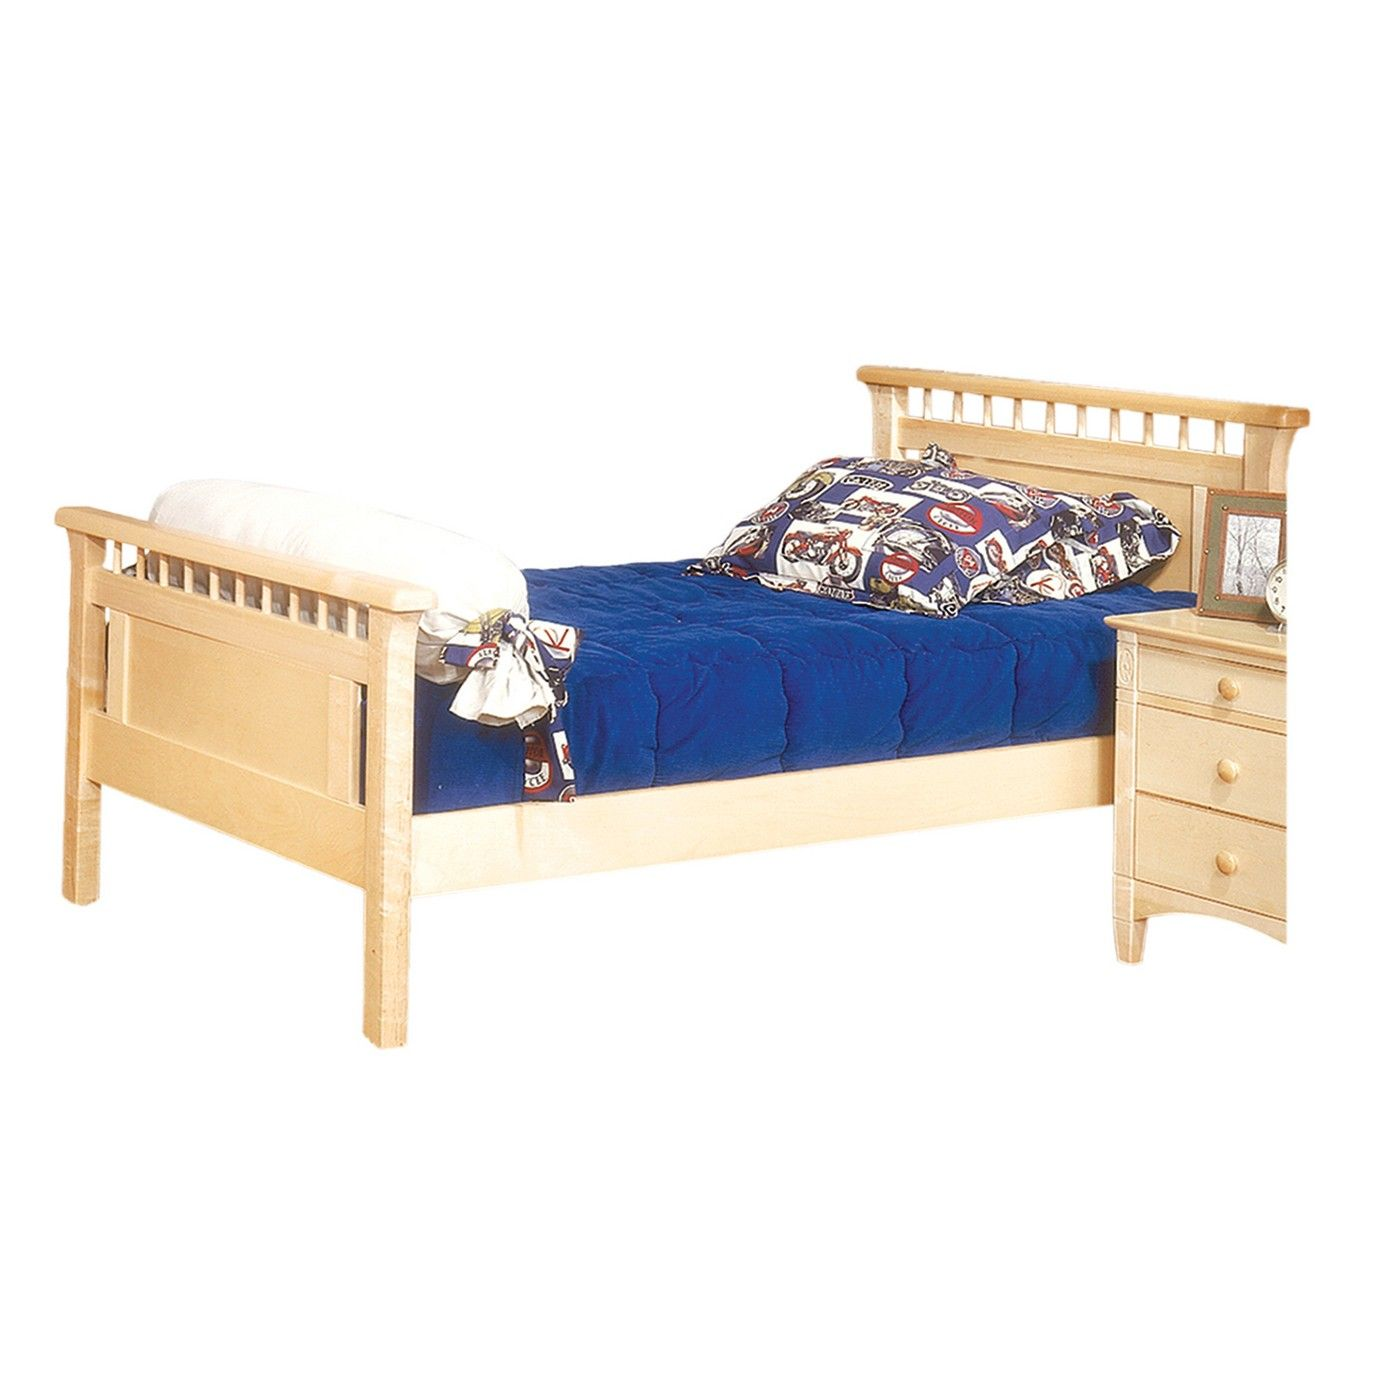 Bennington Twin Bed With Headboard And Footboard Natural